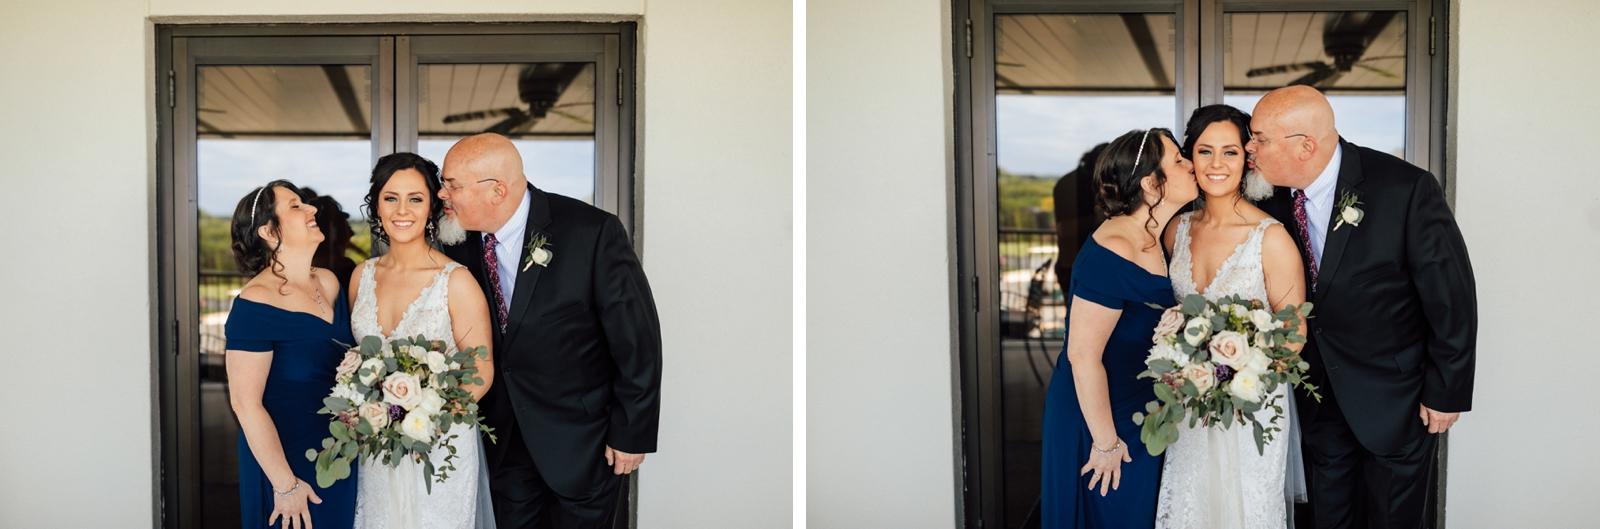 Pittsburgh Wedding Photographer Wildwood Golf Club